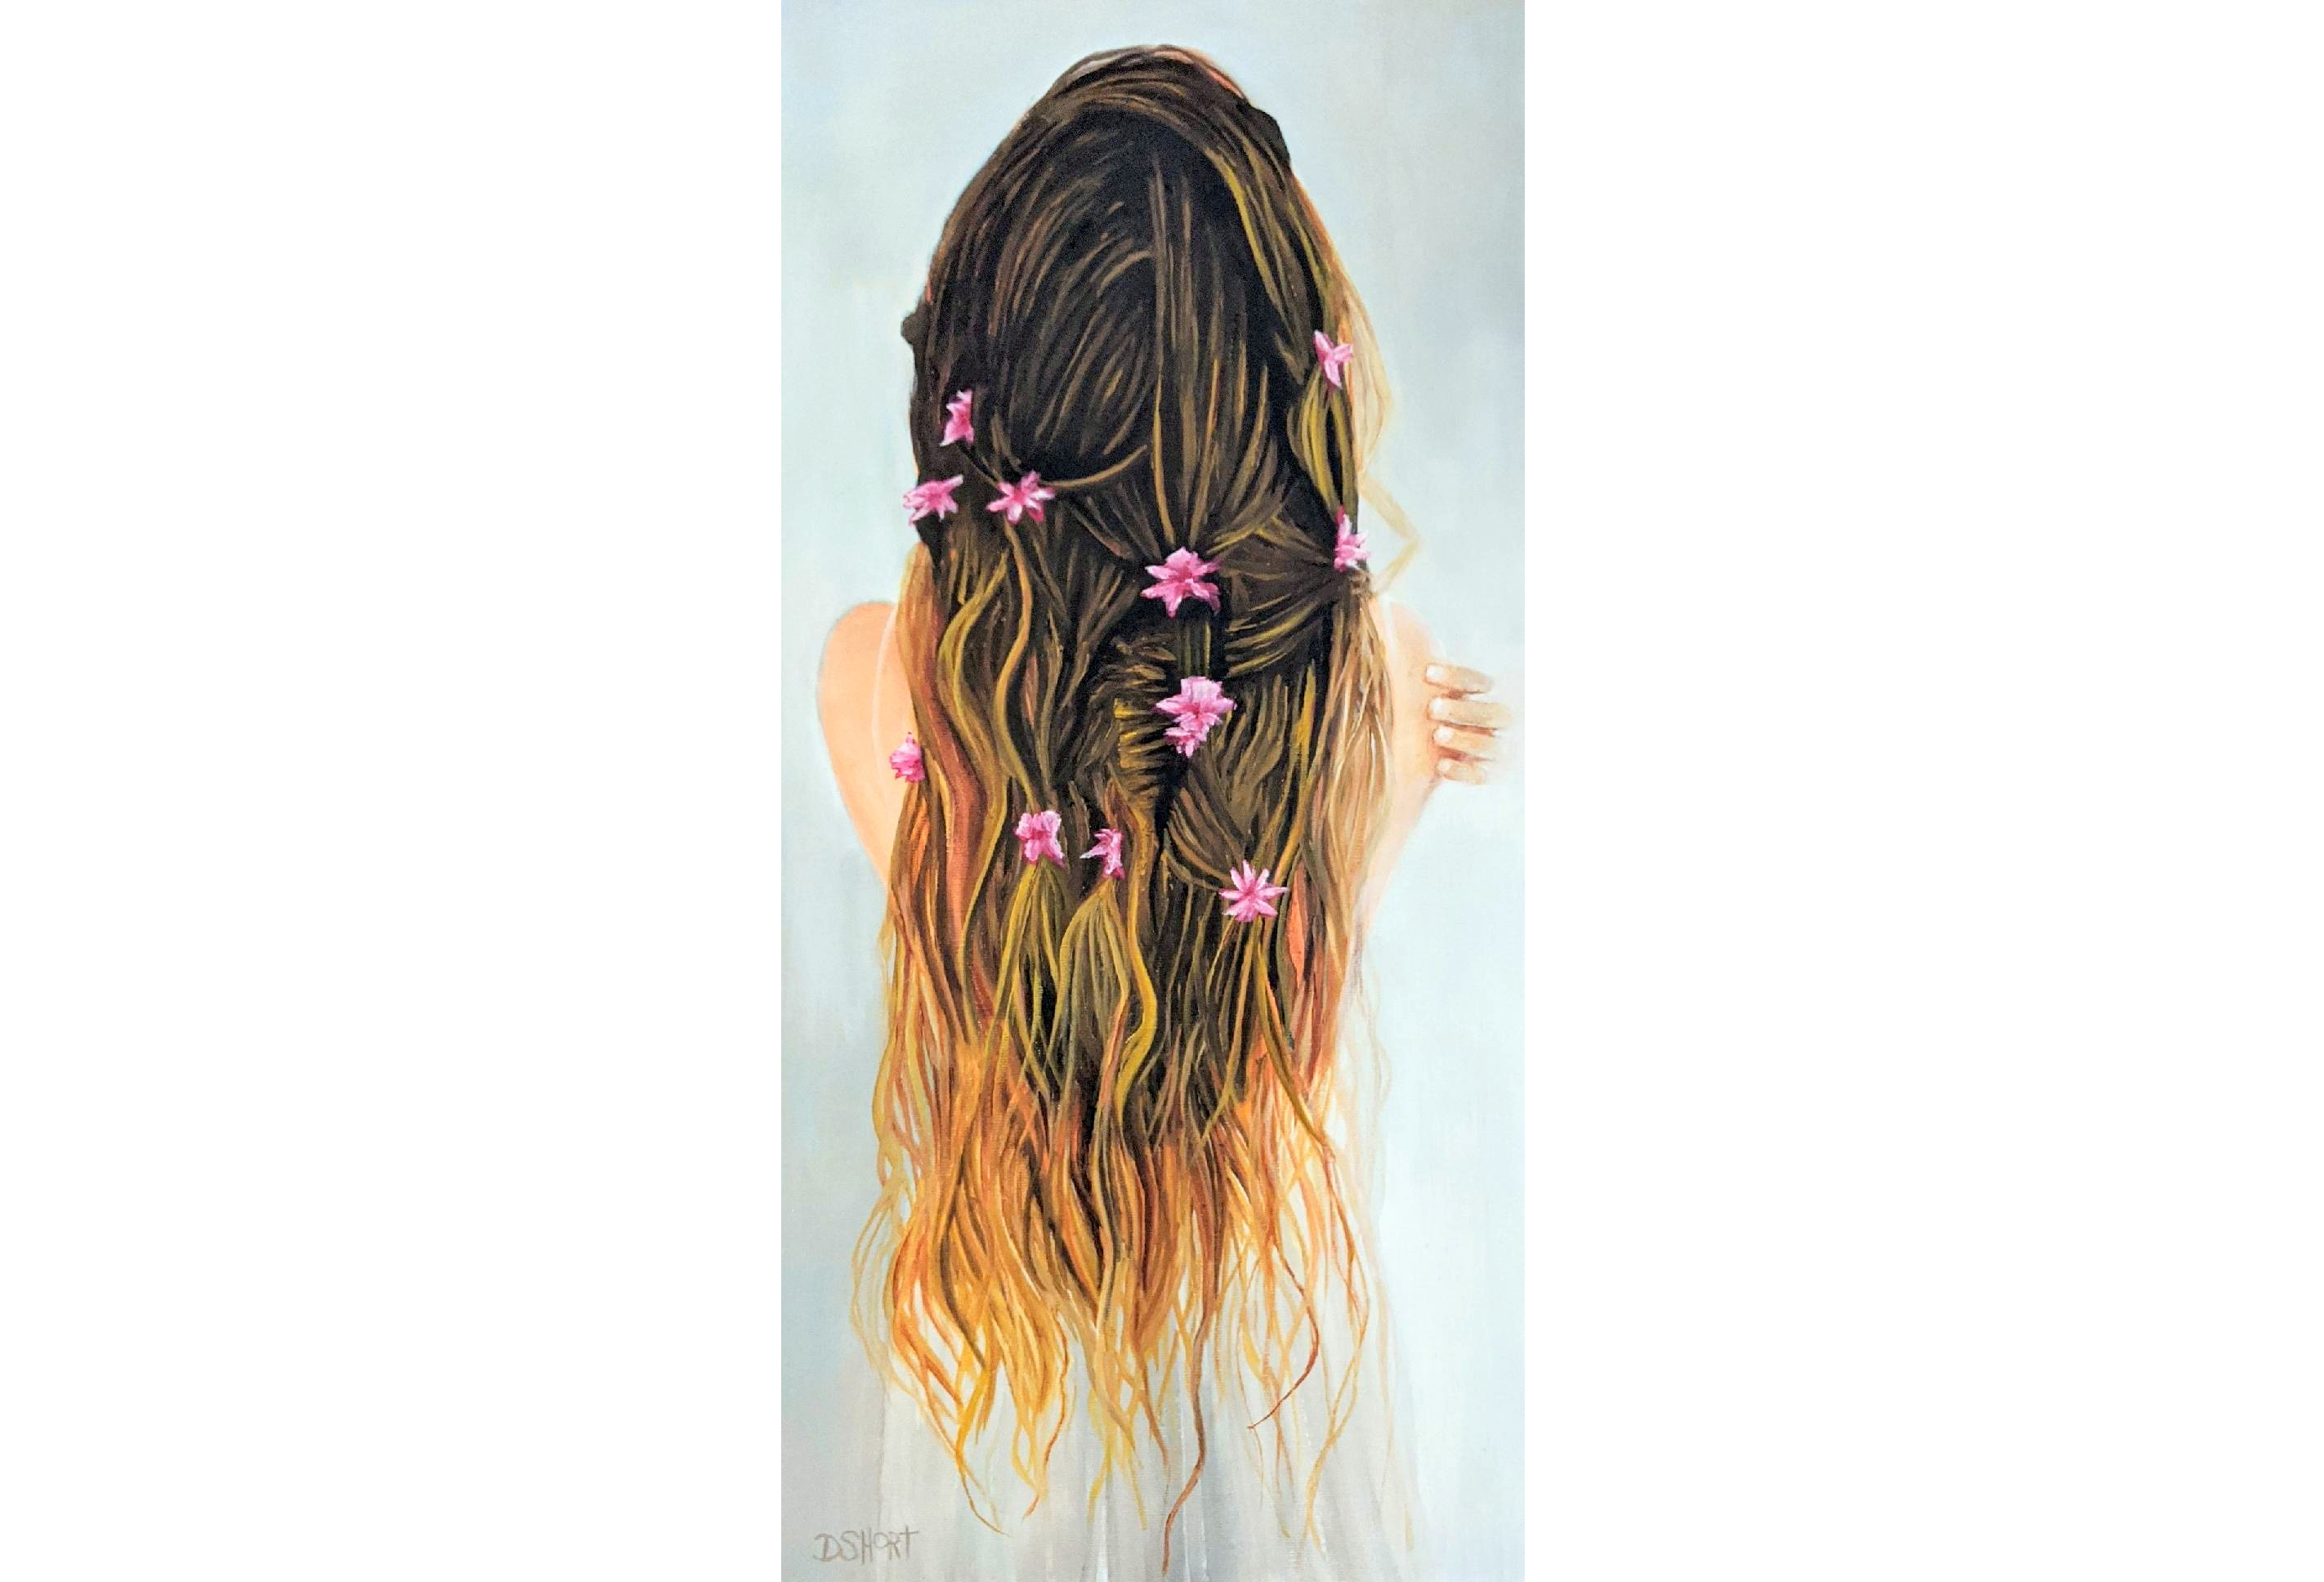 David Short_Be Sure To Wear_ flowers in hair_figurative_Fantastical Florals_Richmond artist